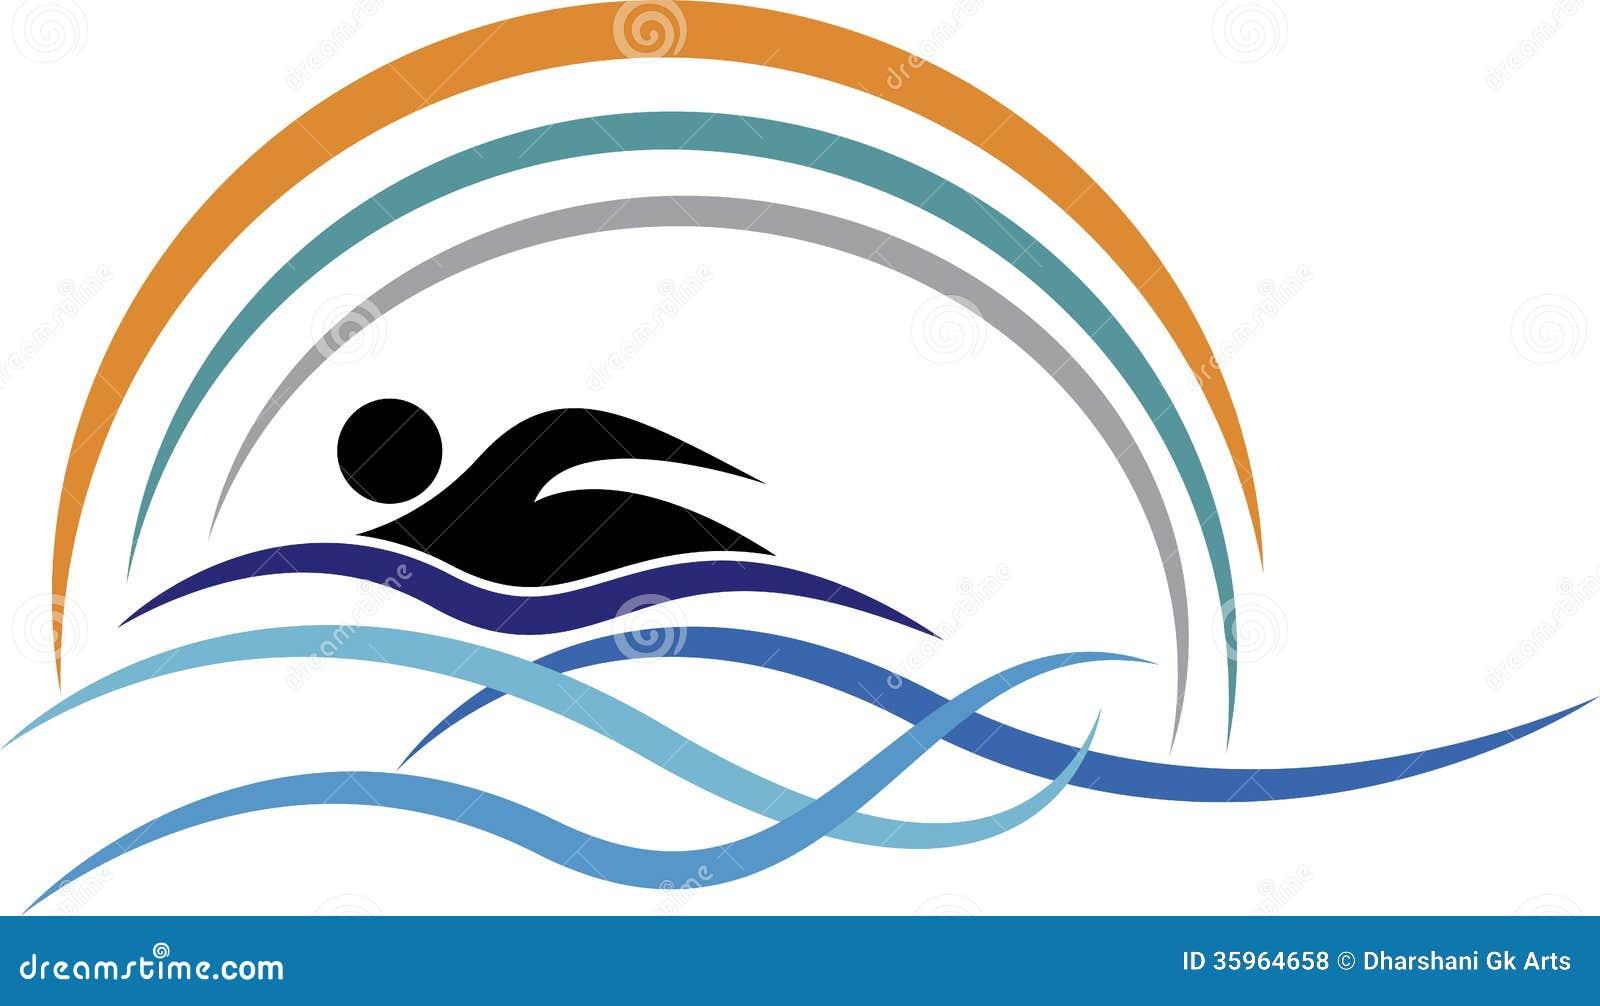 swimming logo stock vector illustration of icon healthy 35964658 rh dreamstime com swimming logos swim team swimming logos images